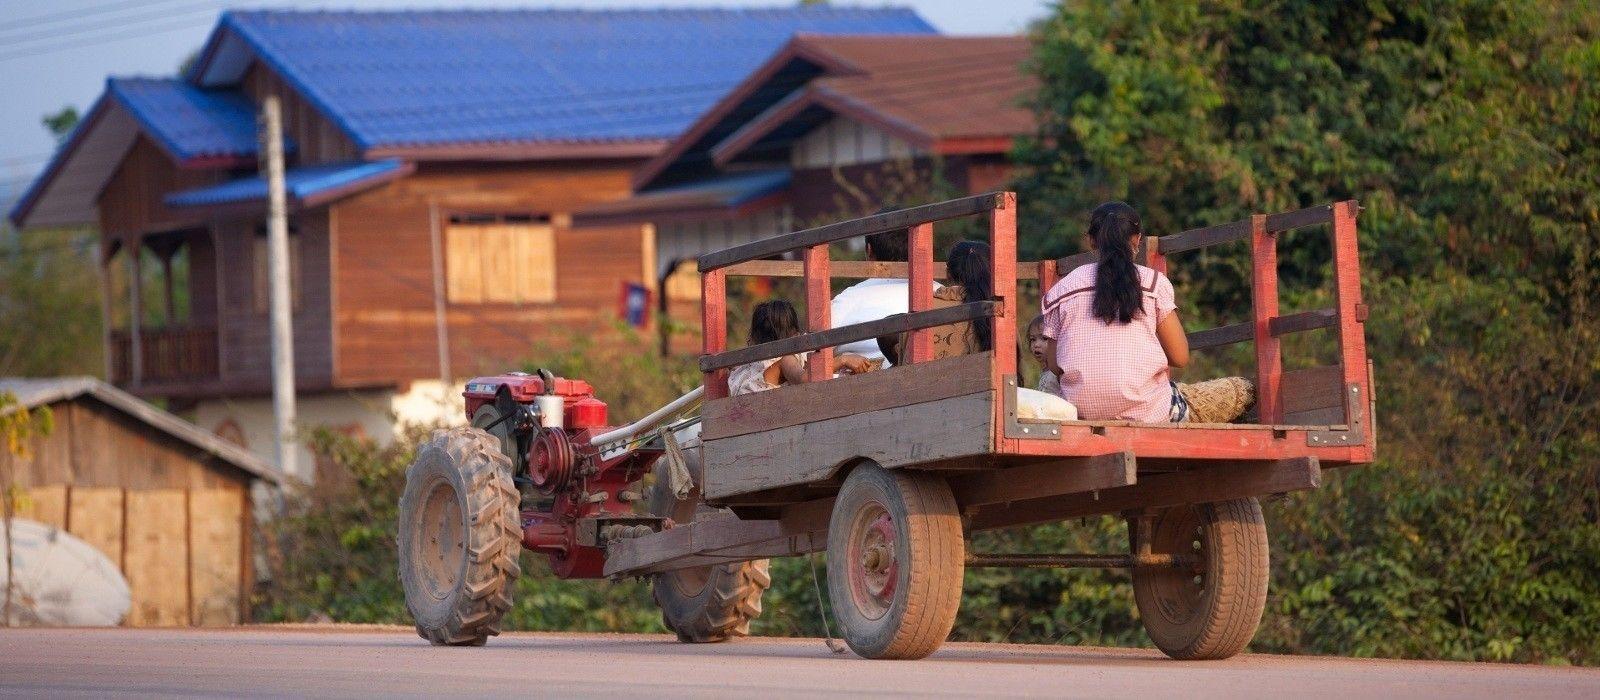 Undiscovered Laos Tour Trip 8